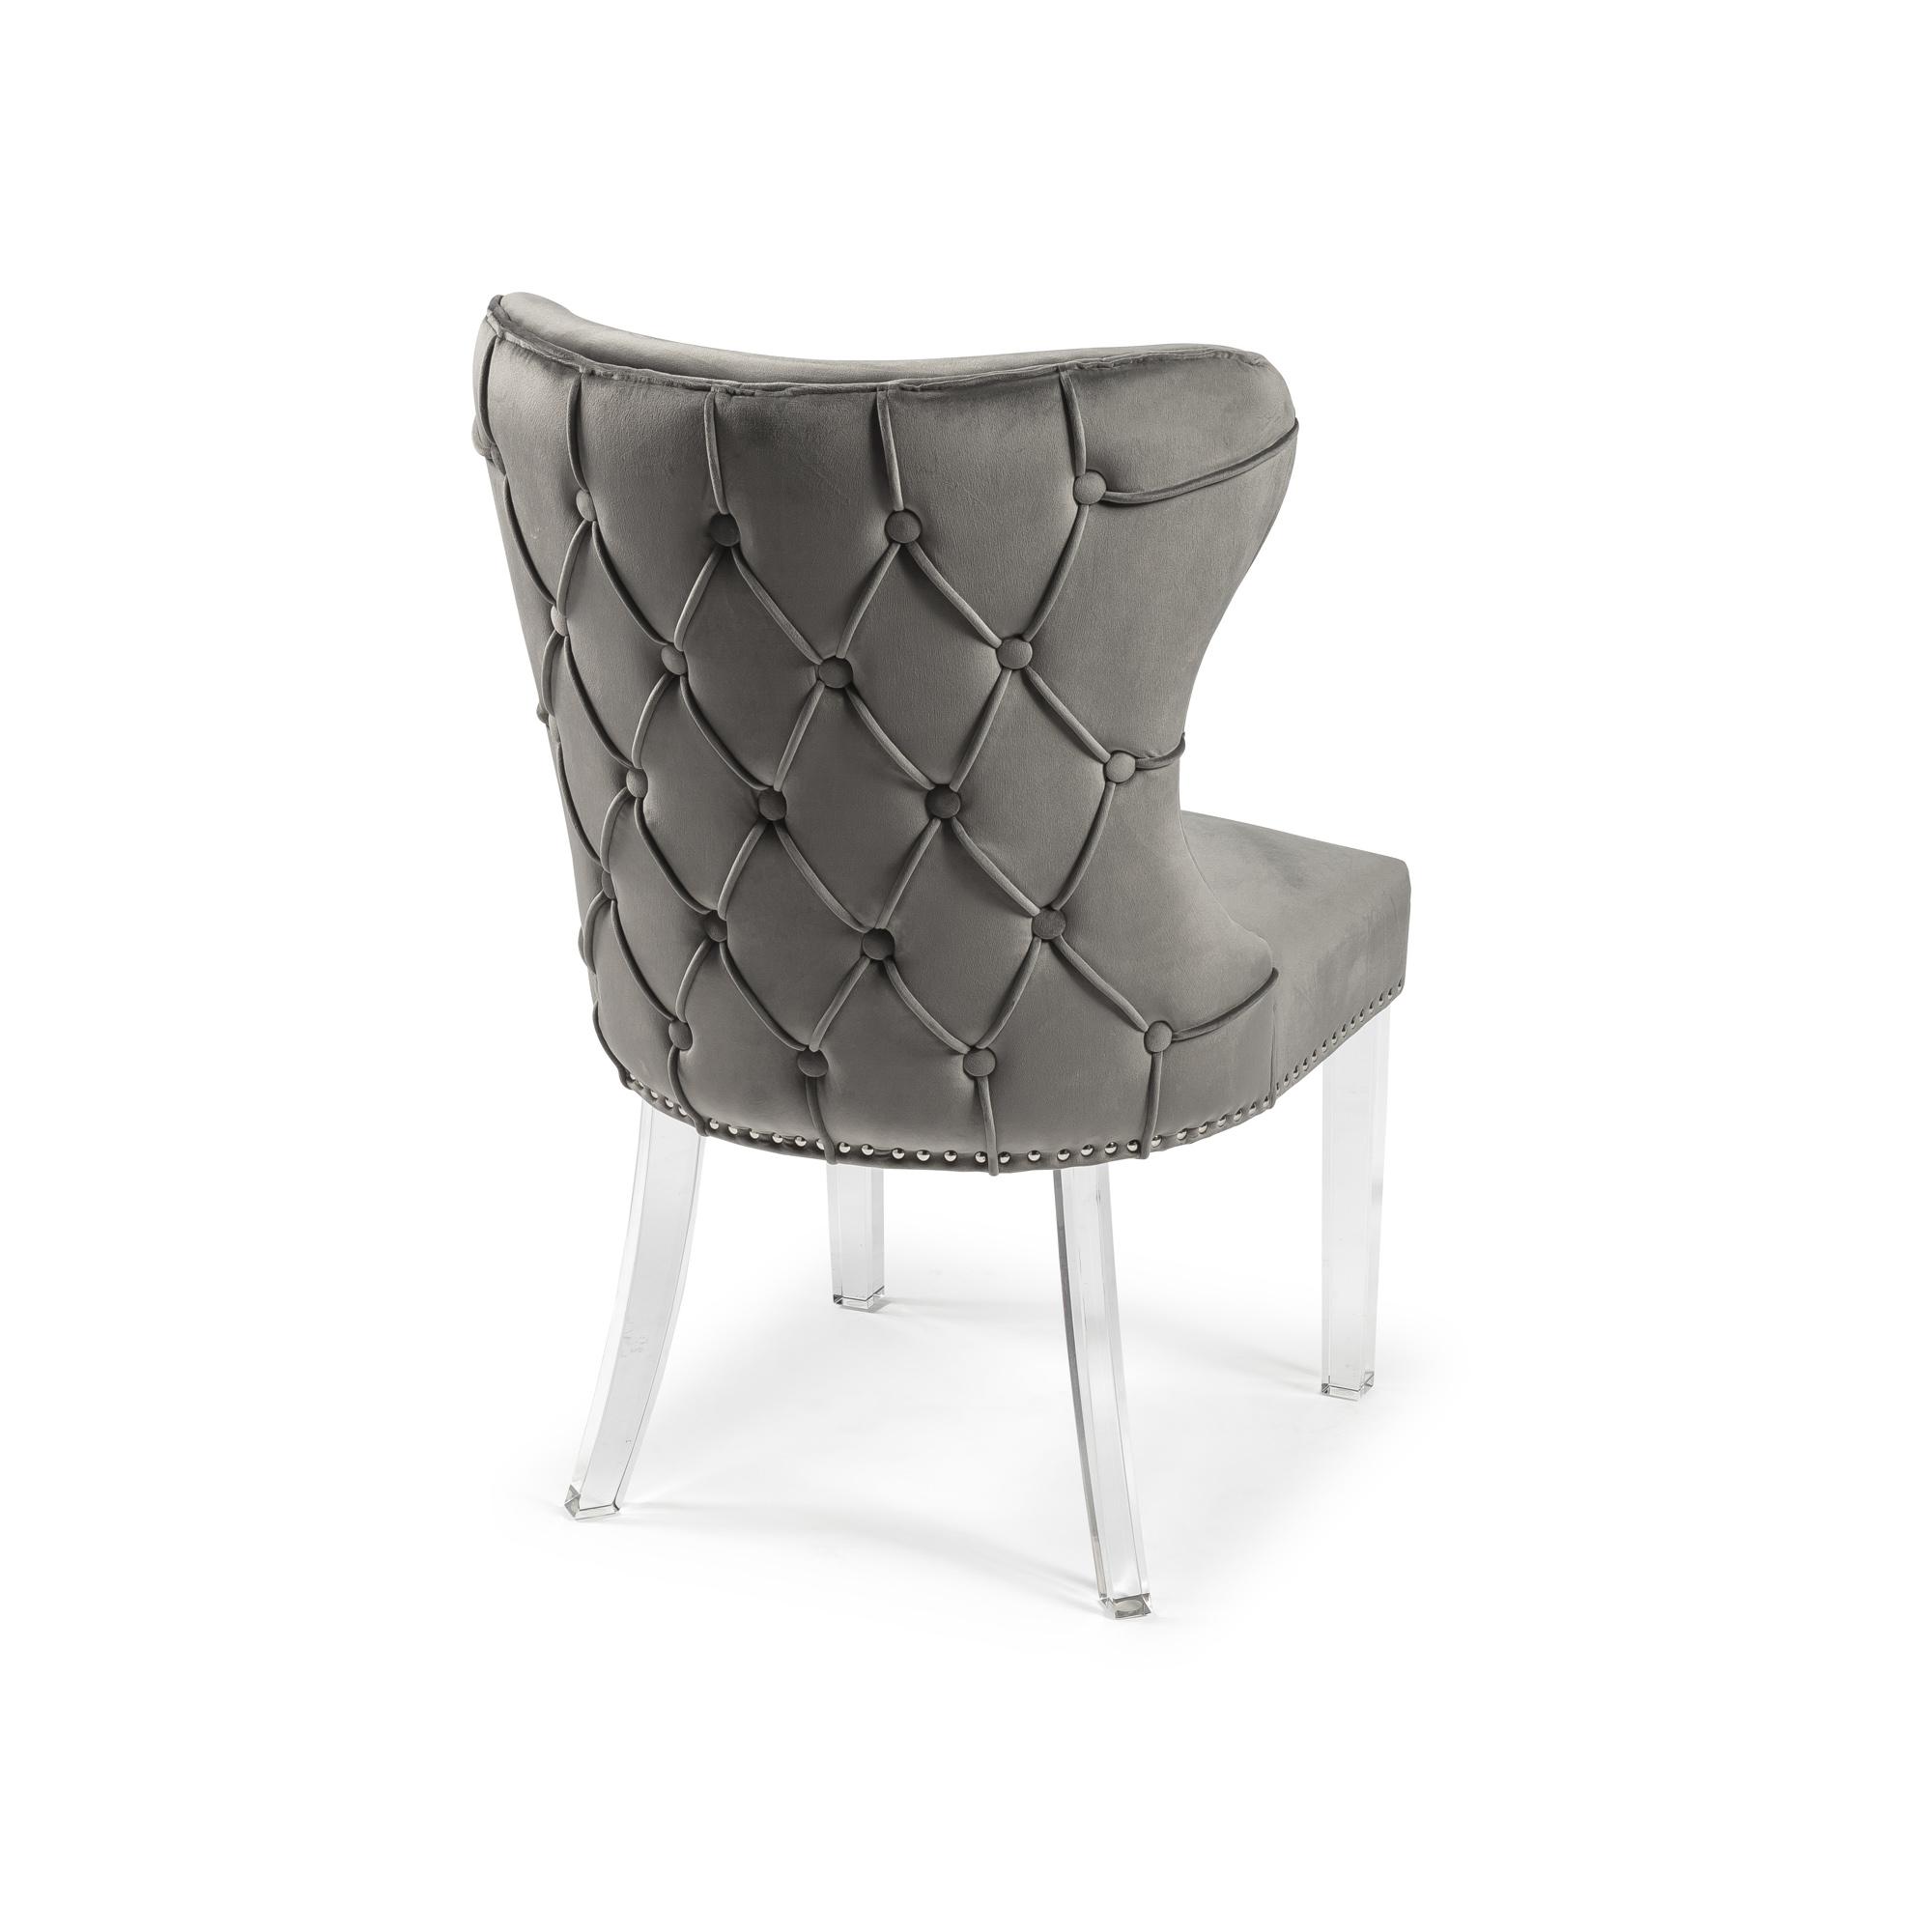 Grey Velvet Dining Chair with Acrylic Legs